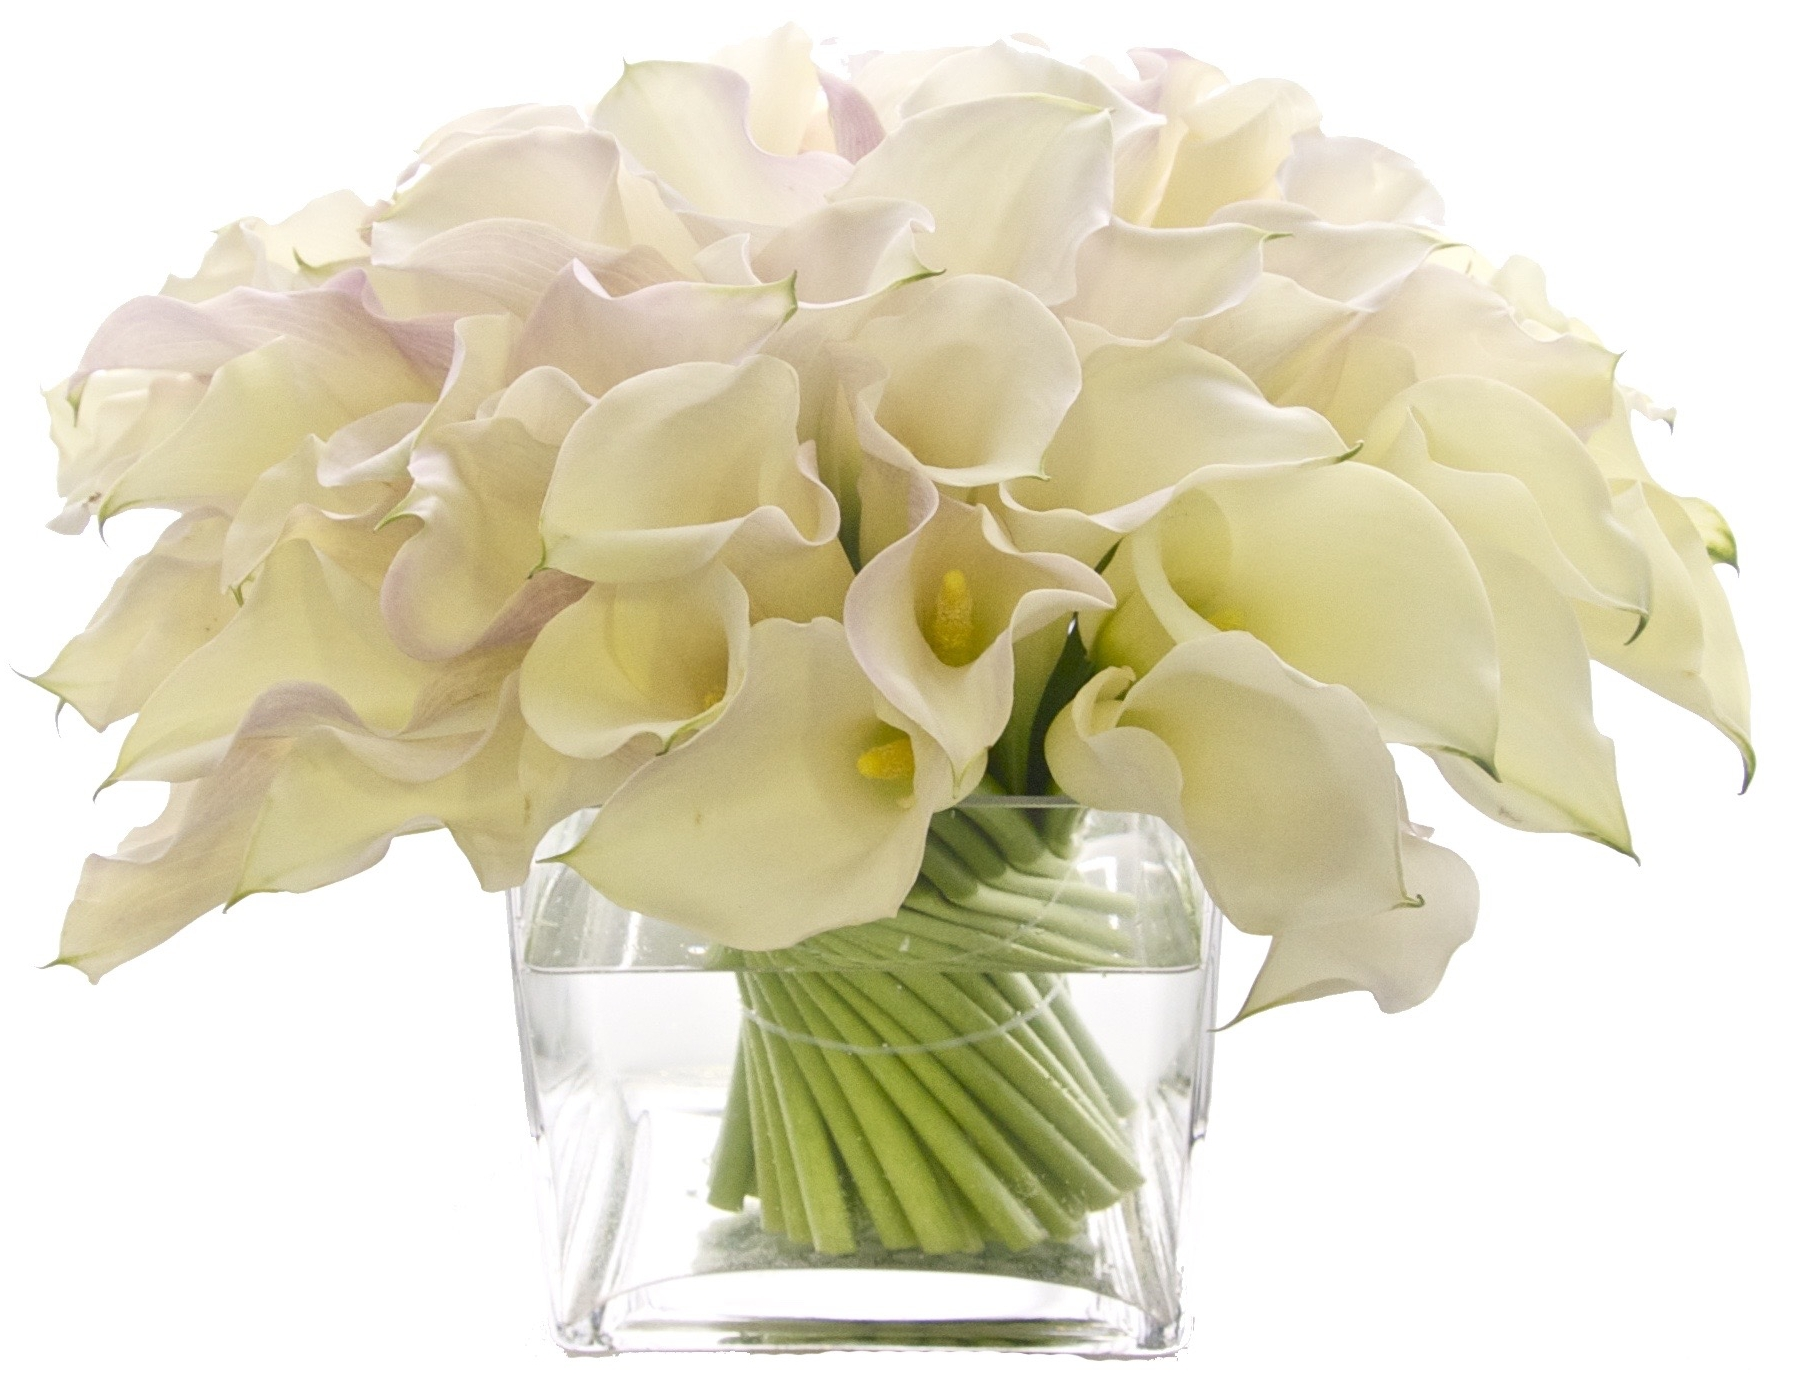 White Callas start at $250